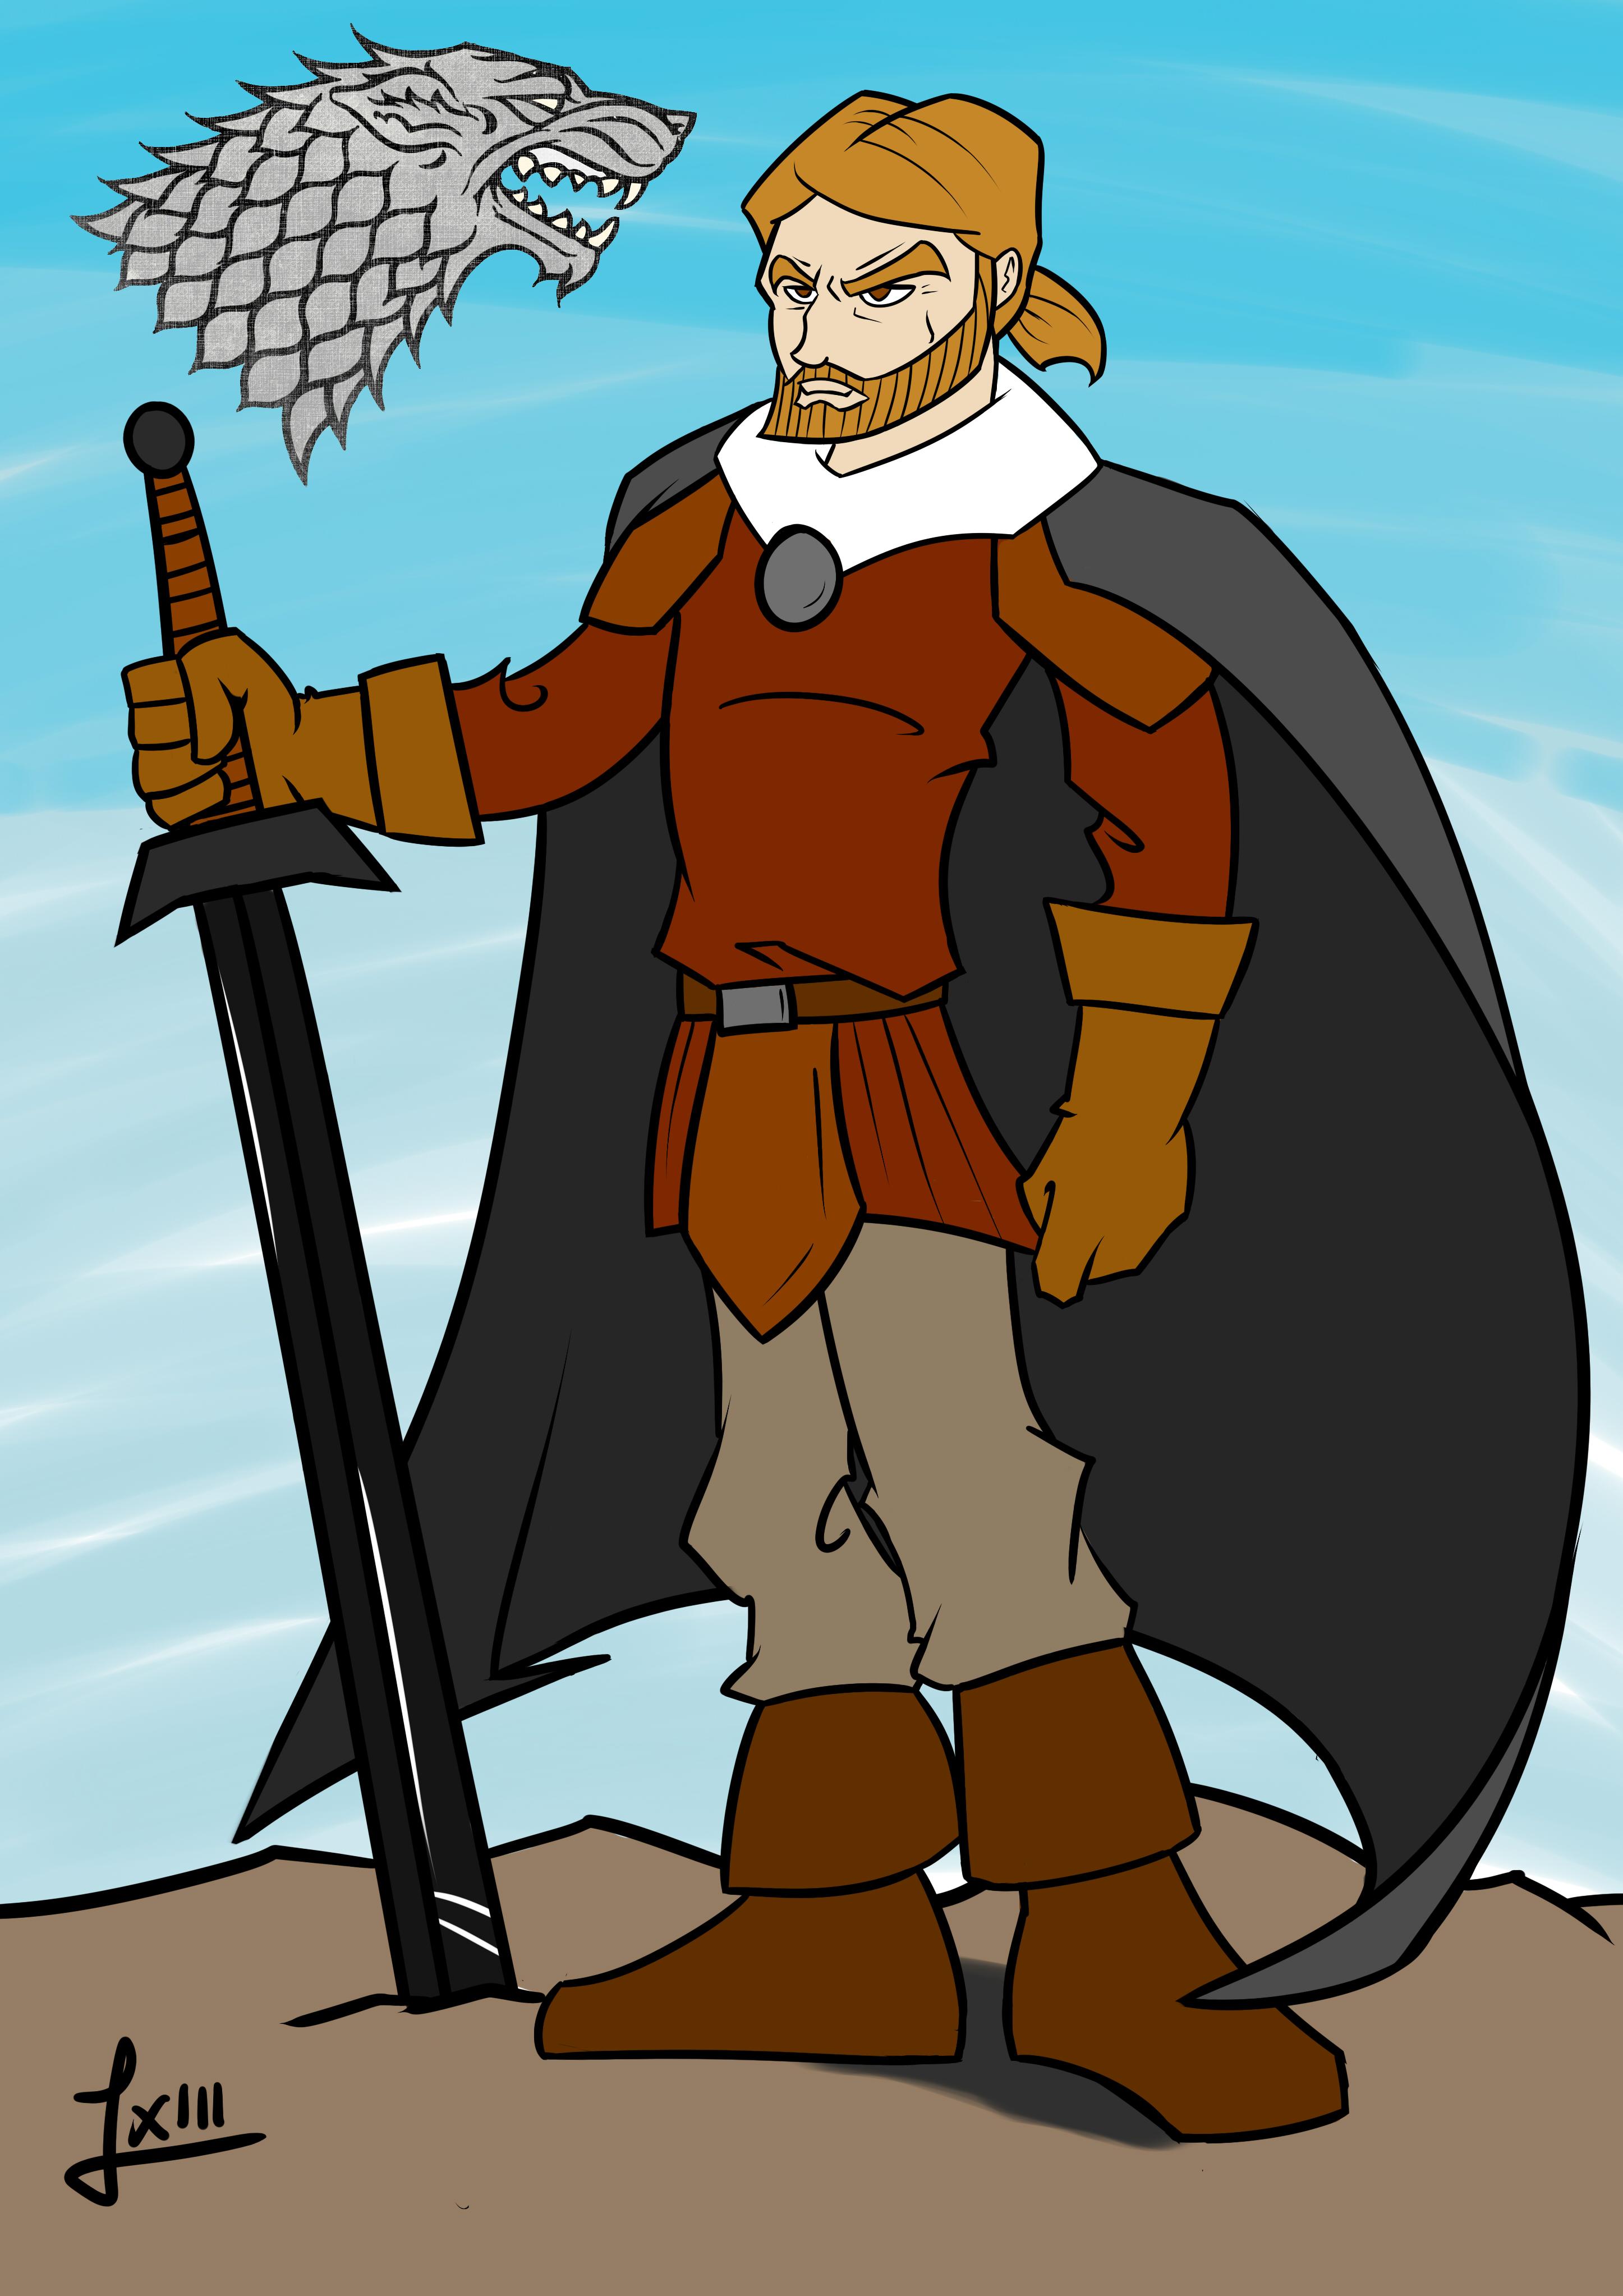 Eddard Stark cartoon style